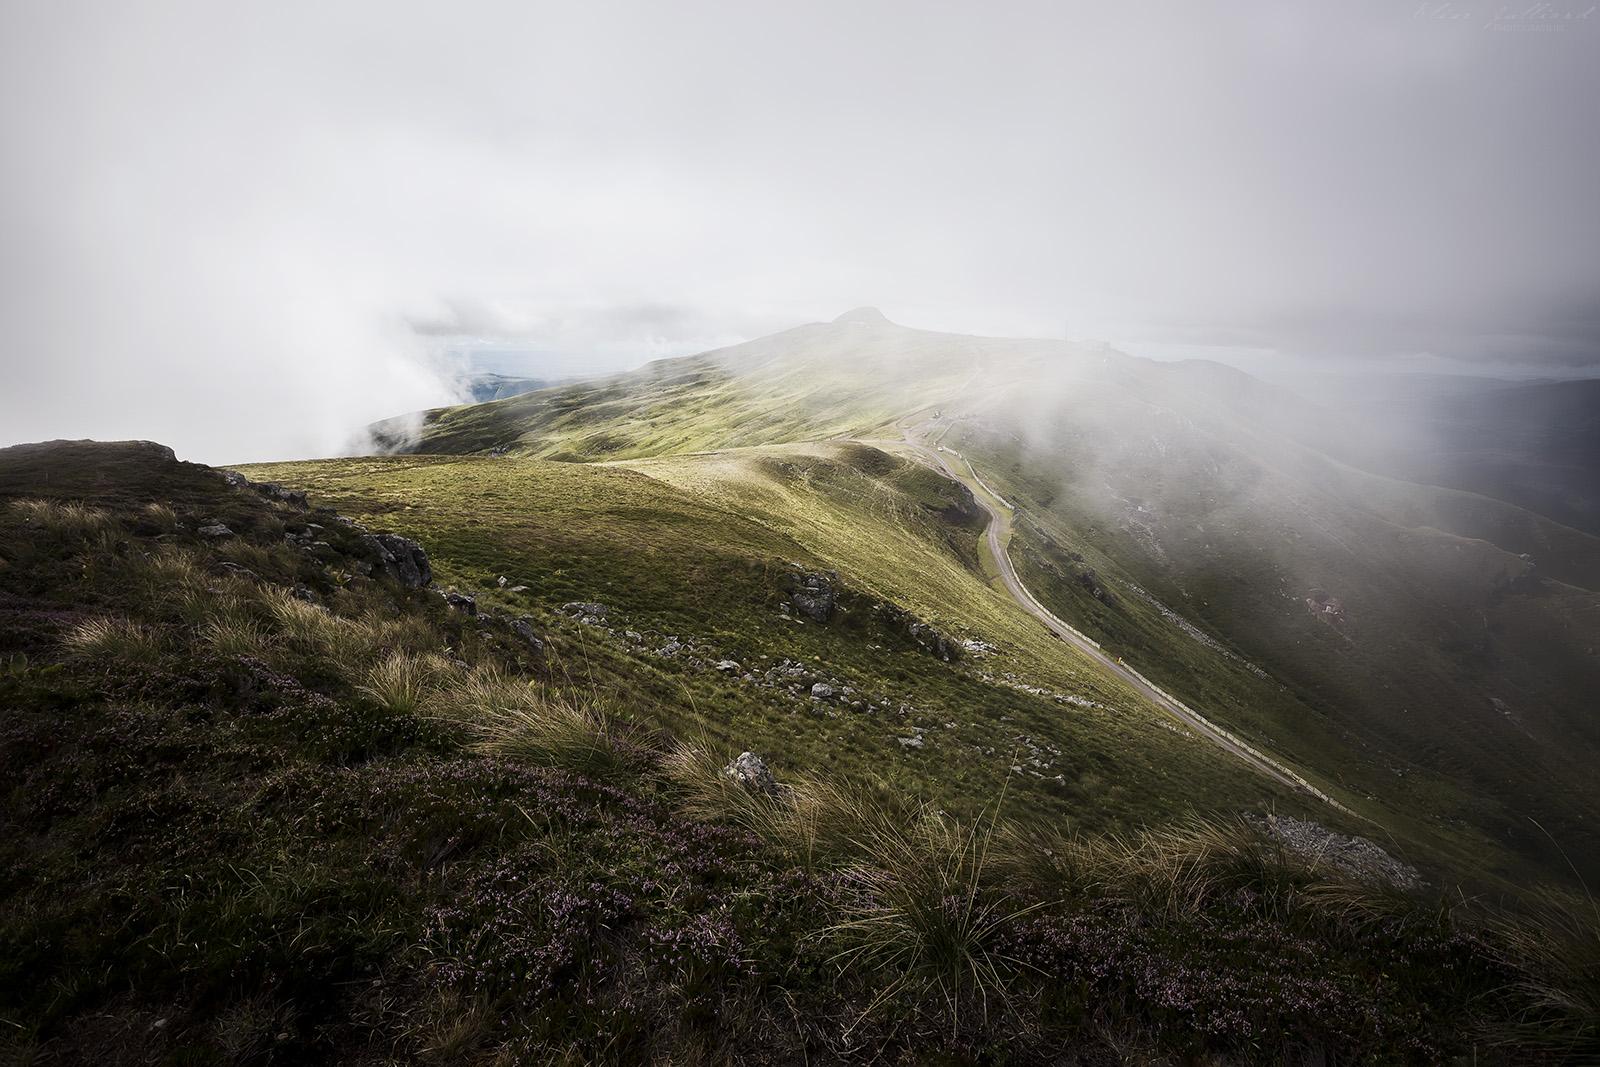 plomb-du-cantal-auvergne-rhone-alpes-massif-central-volcan-stratovolcan-saint-jacques-des-blats-super-lioran-albepierre-bredons-elise-julliard-photographe-paysage-montagne-brume